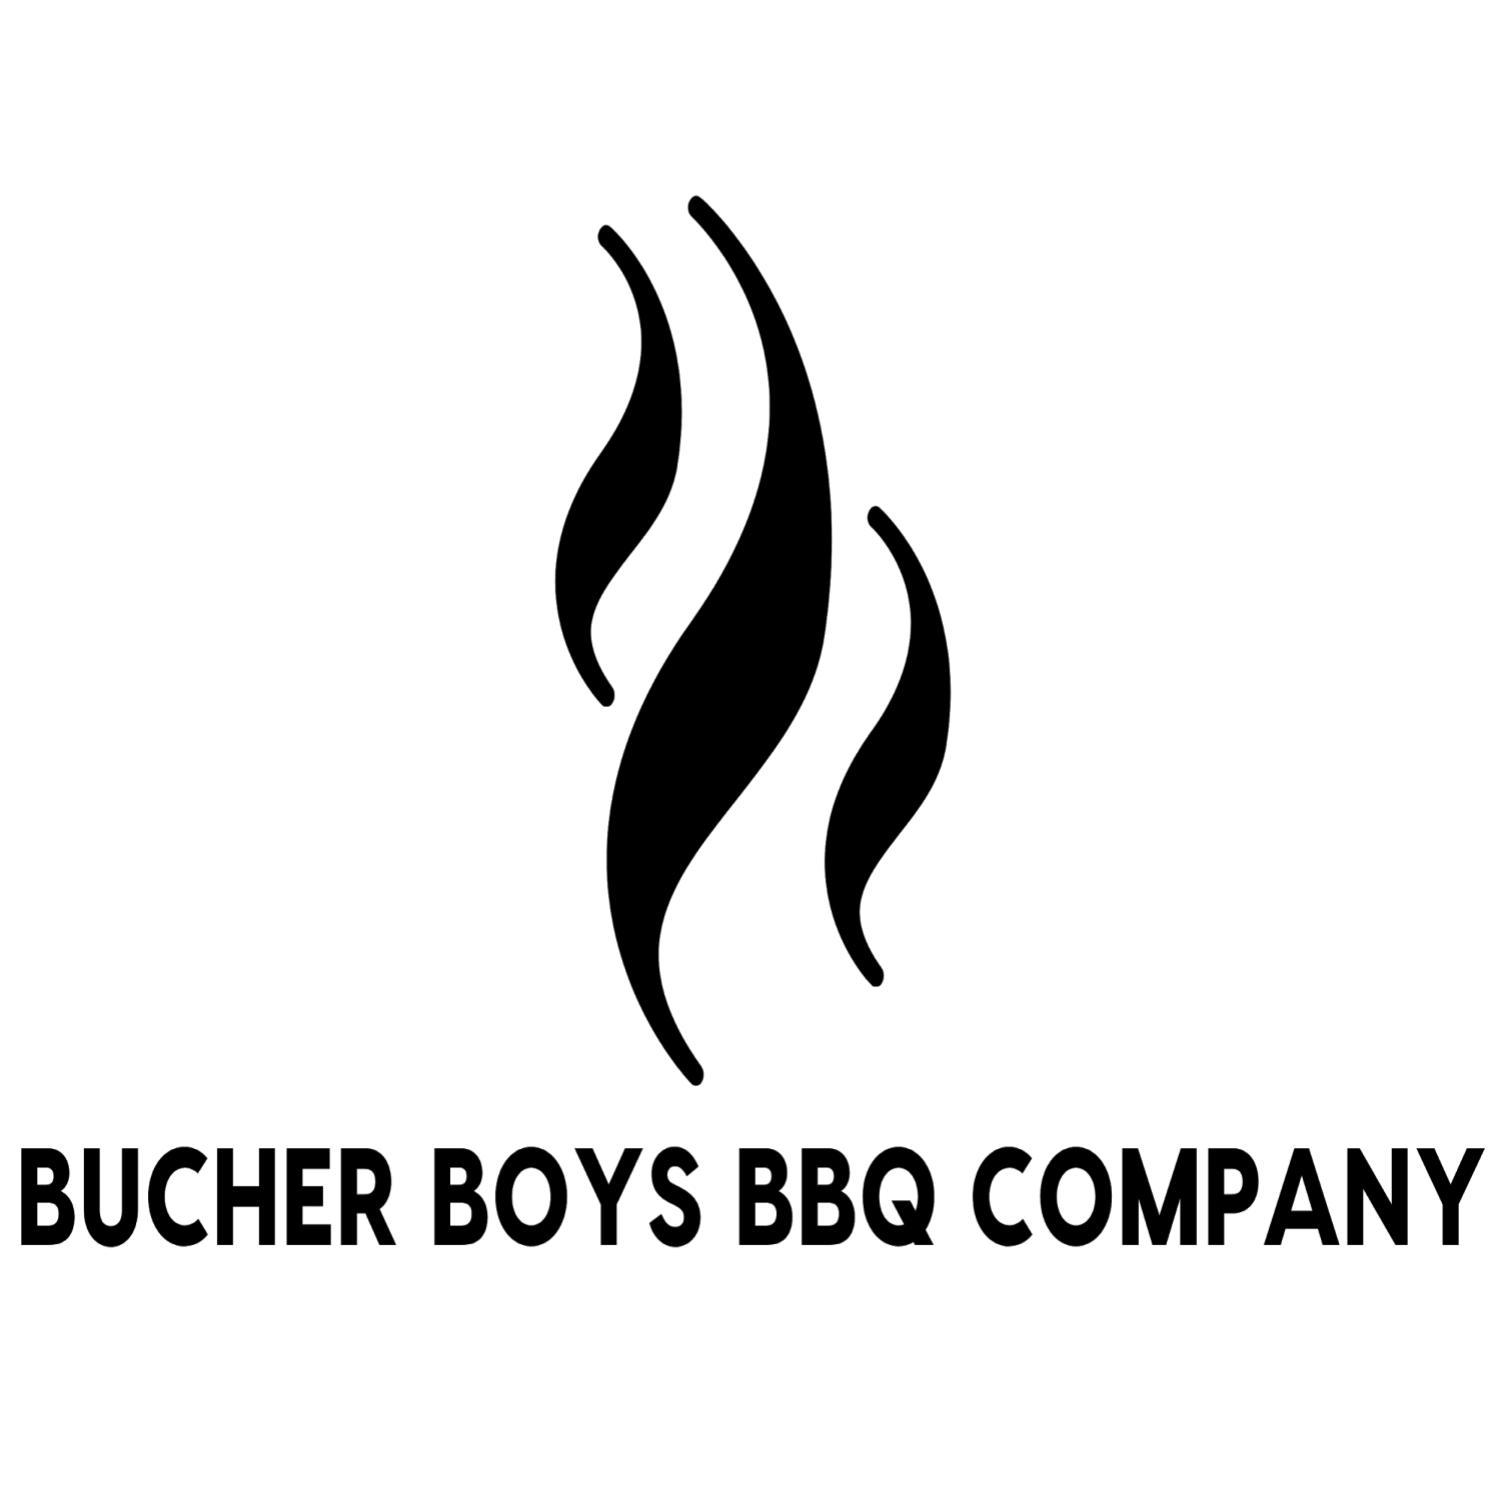 Bucher Boys BBQ Company, LLC primary image